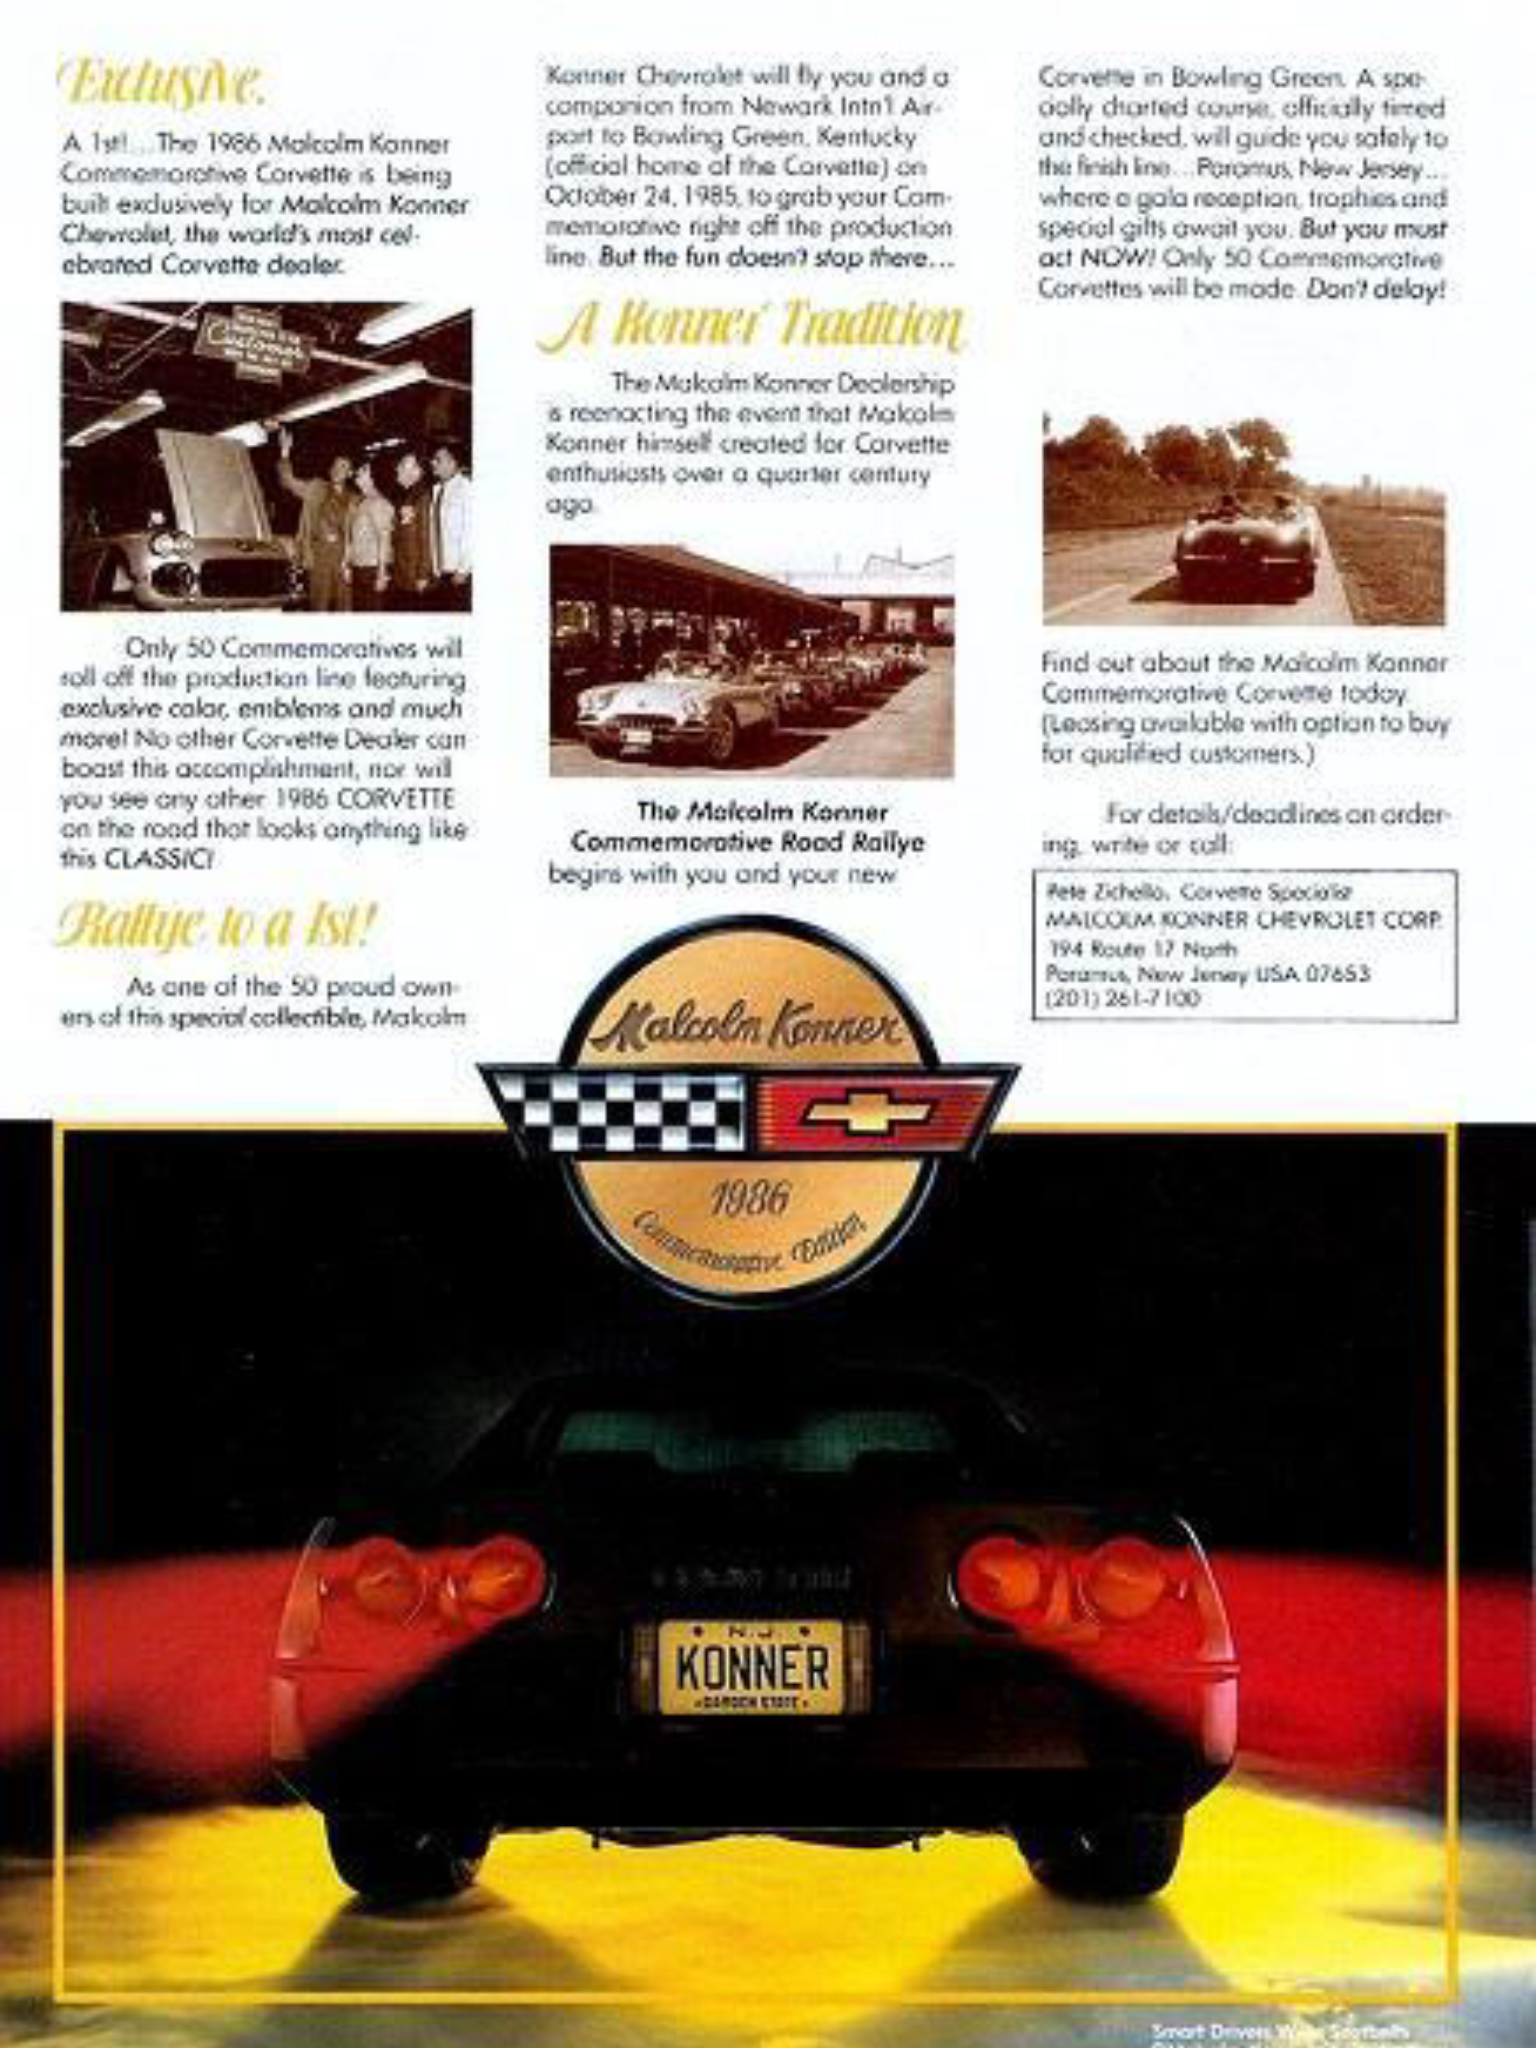 1986 Chevrolet Corvette Malcolm Konner Chevrolet Dealership Commemorative Edition Paramus New Jersey Rar Corvette Chevrolet Dealership Chevrolet Corvette